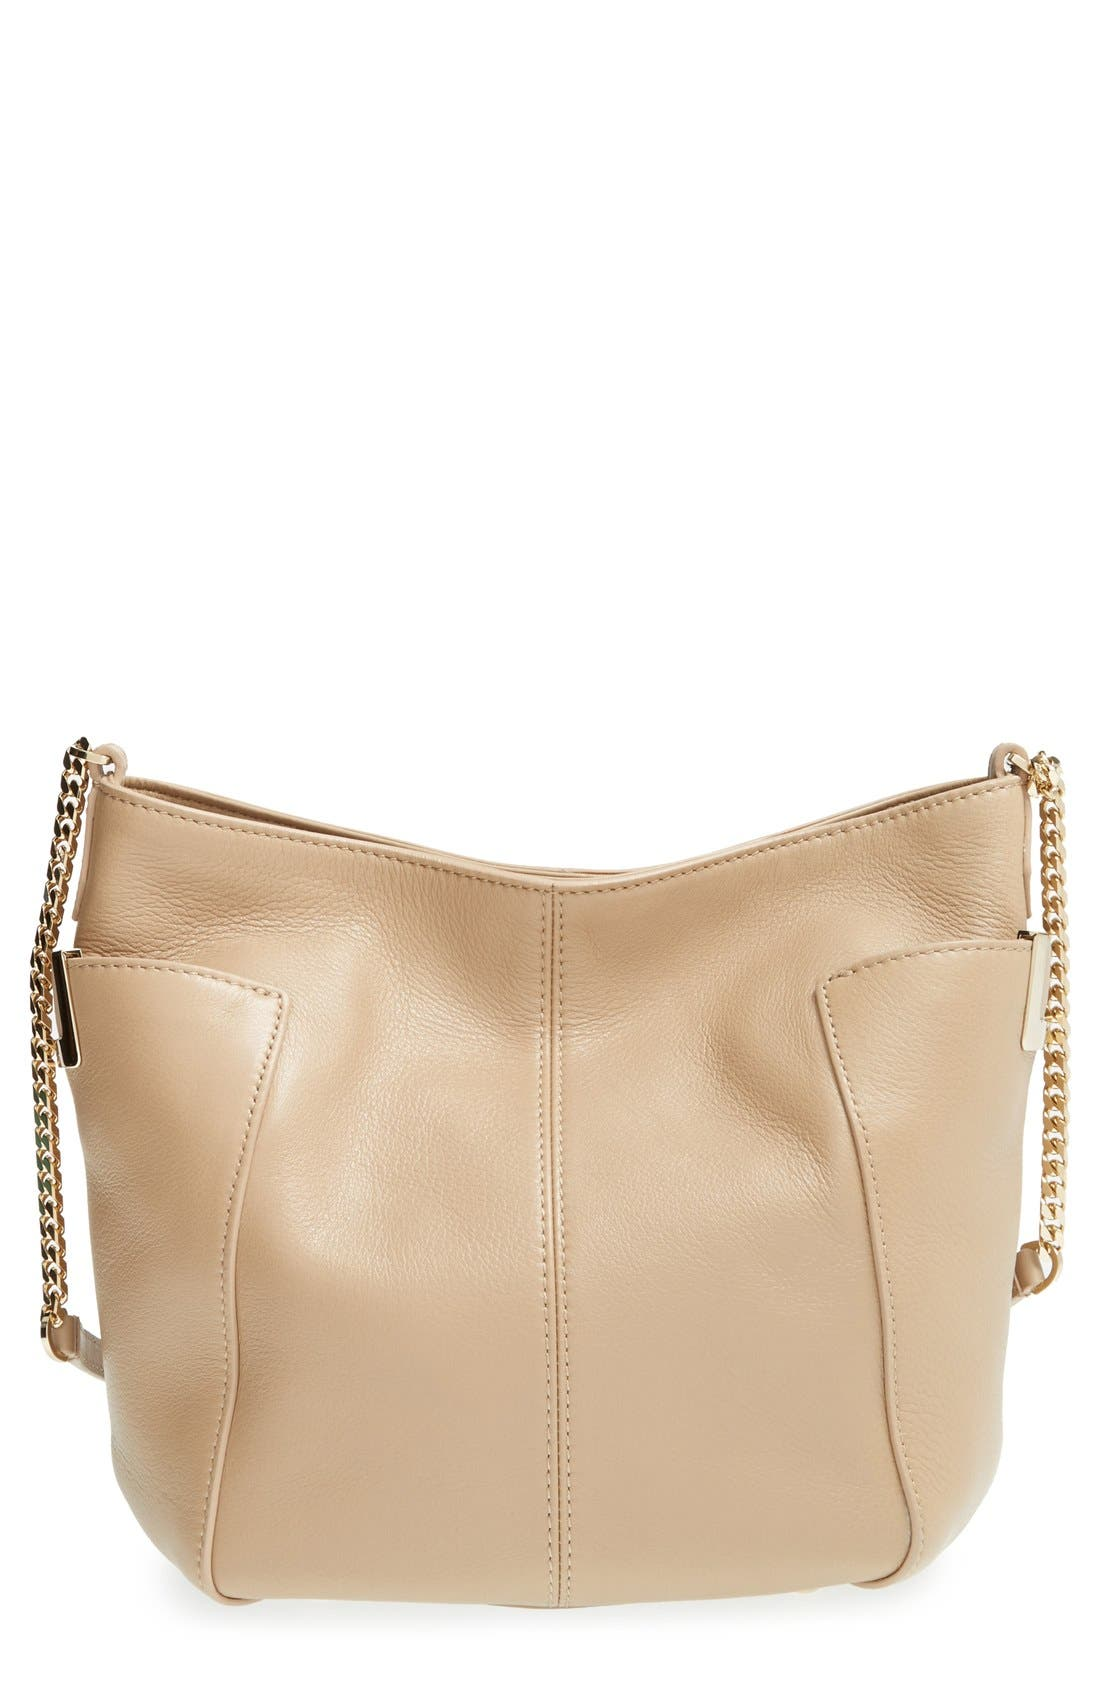 Main Image - Jimmy Choo 'Small Anabel' Leather Crossbody Bag